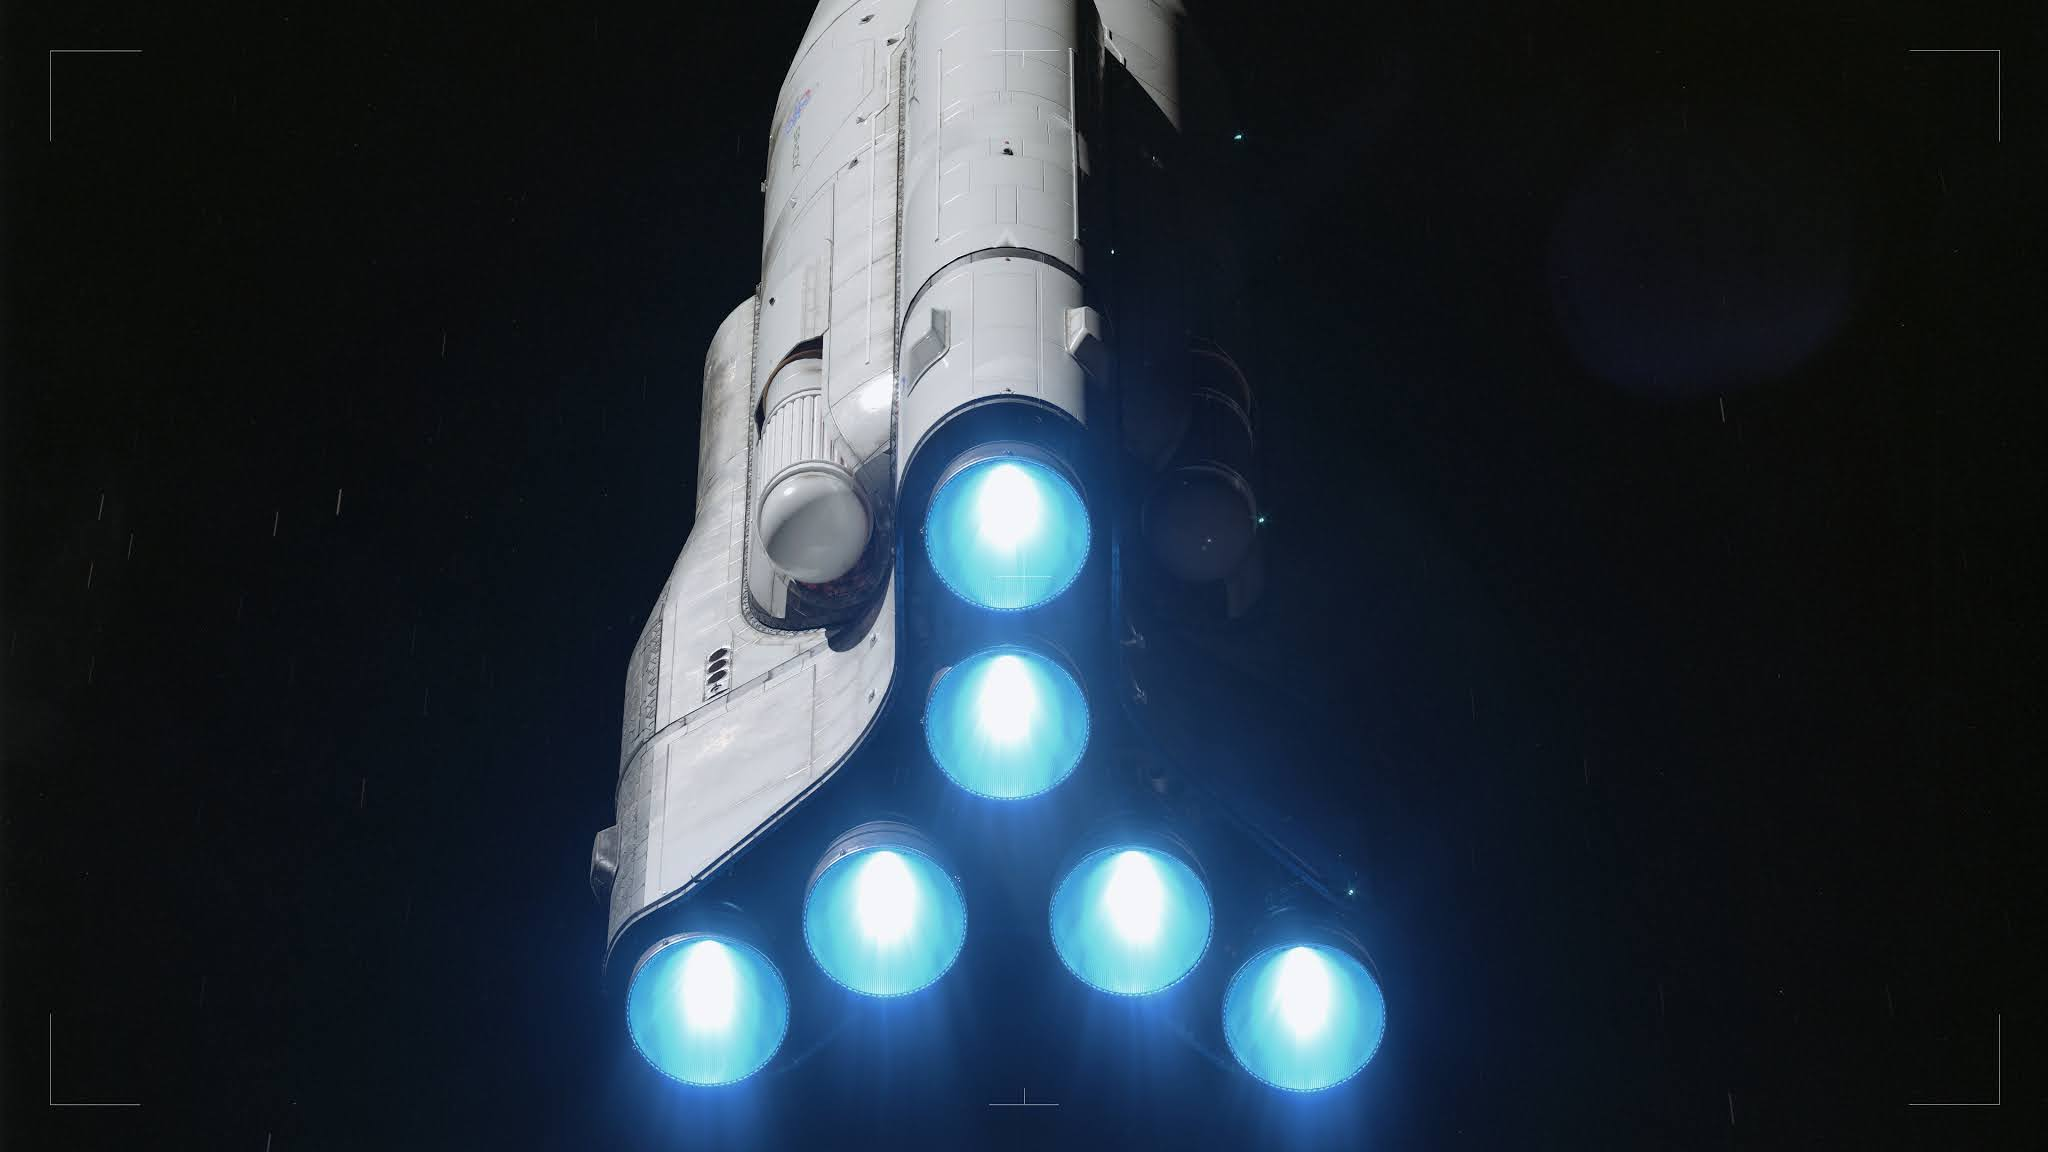 Phoenix - Interplanetary Autonomous Payload System cool spaceship background wallpaper for desktop